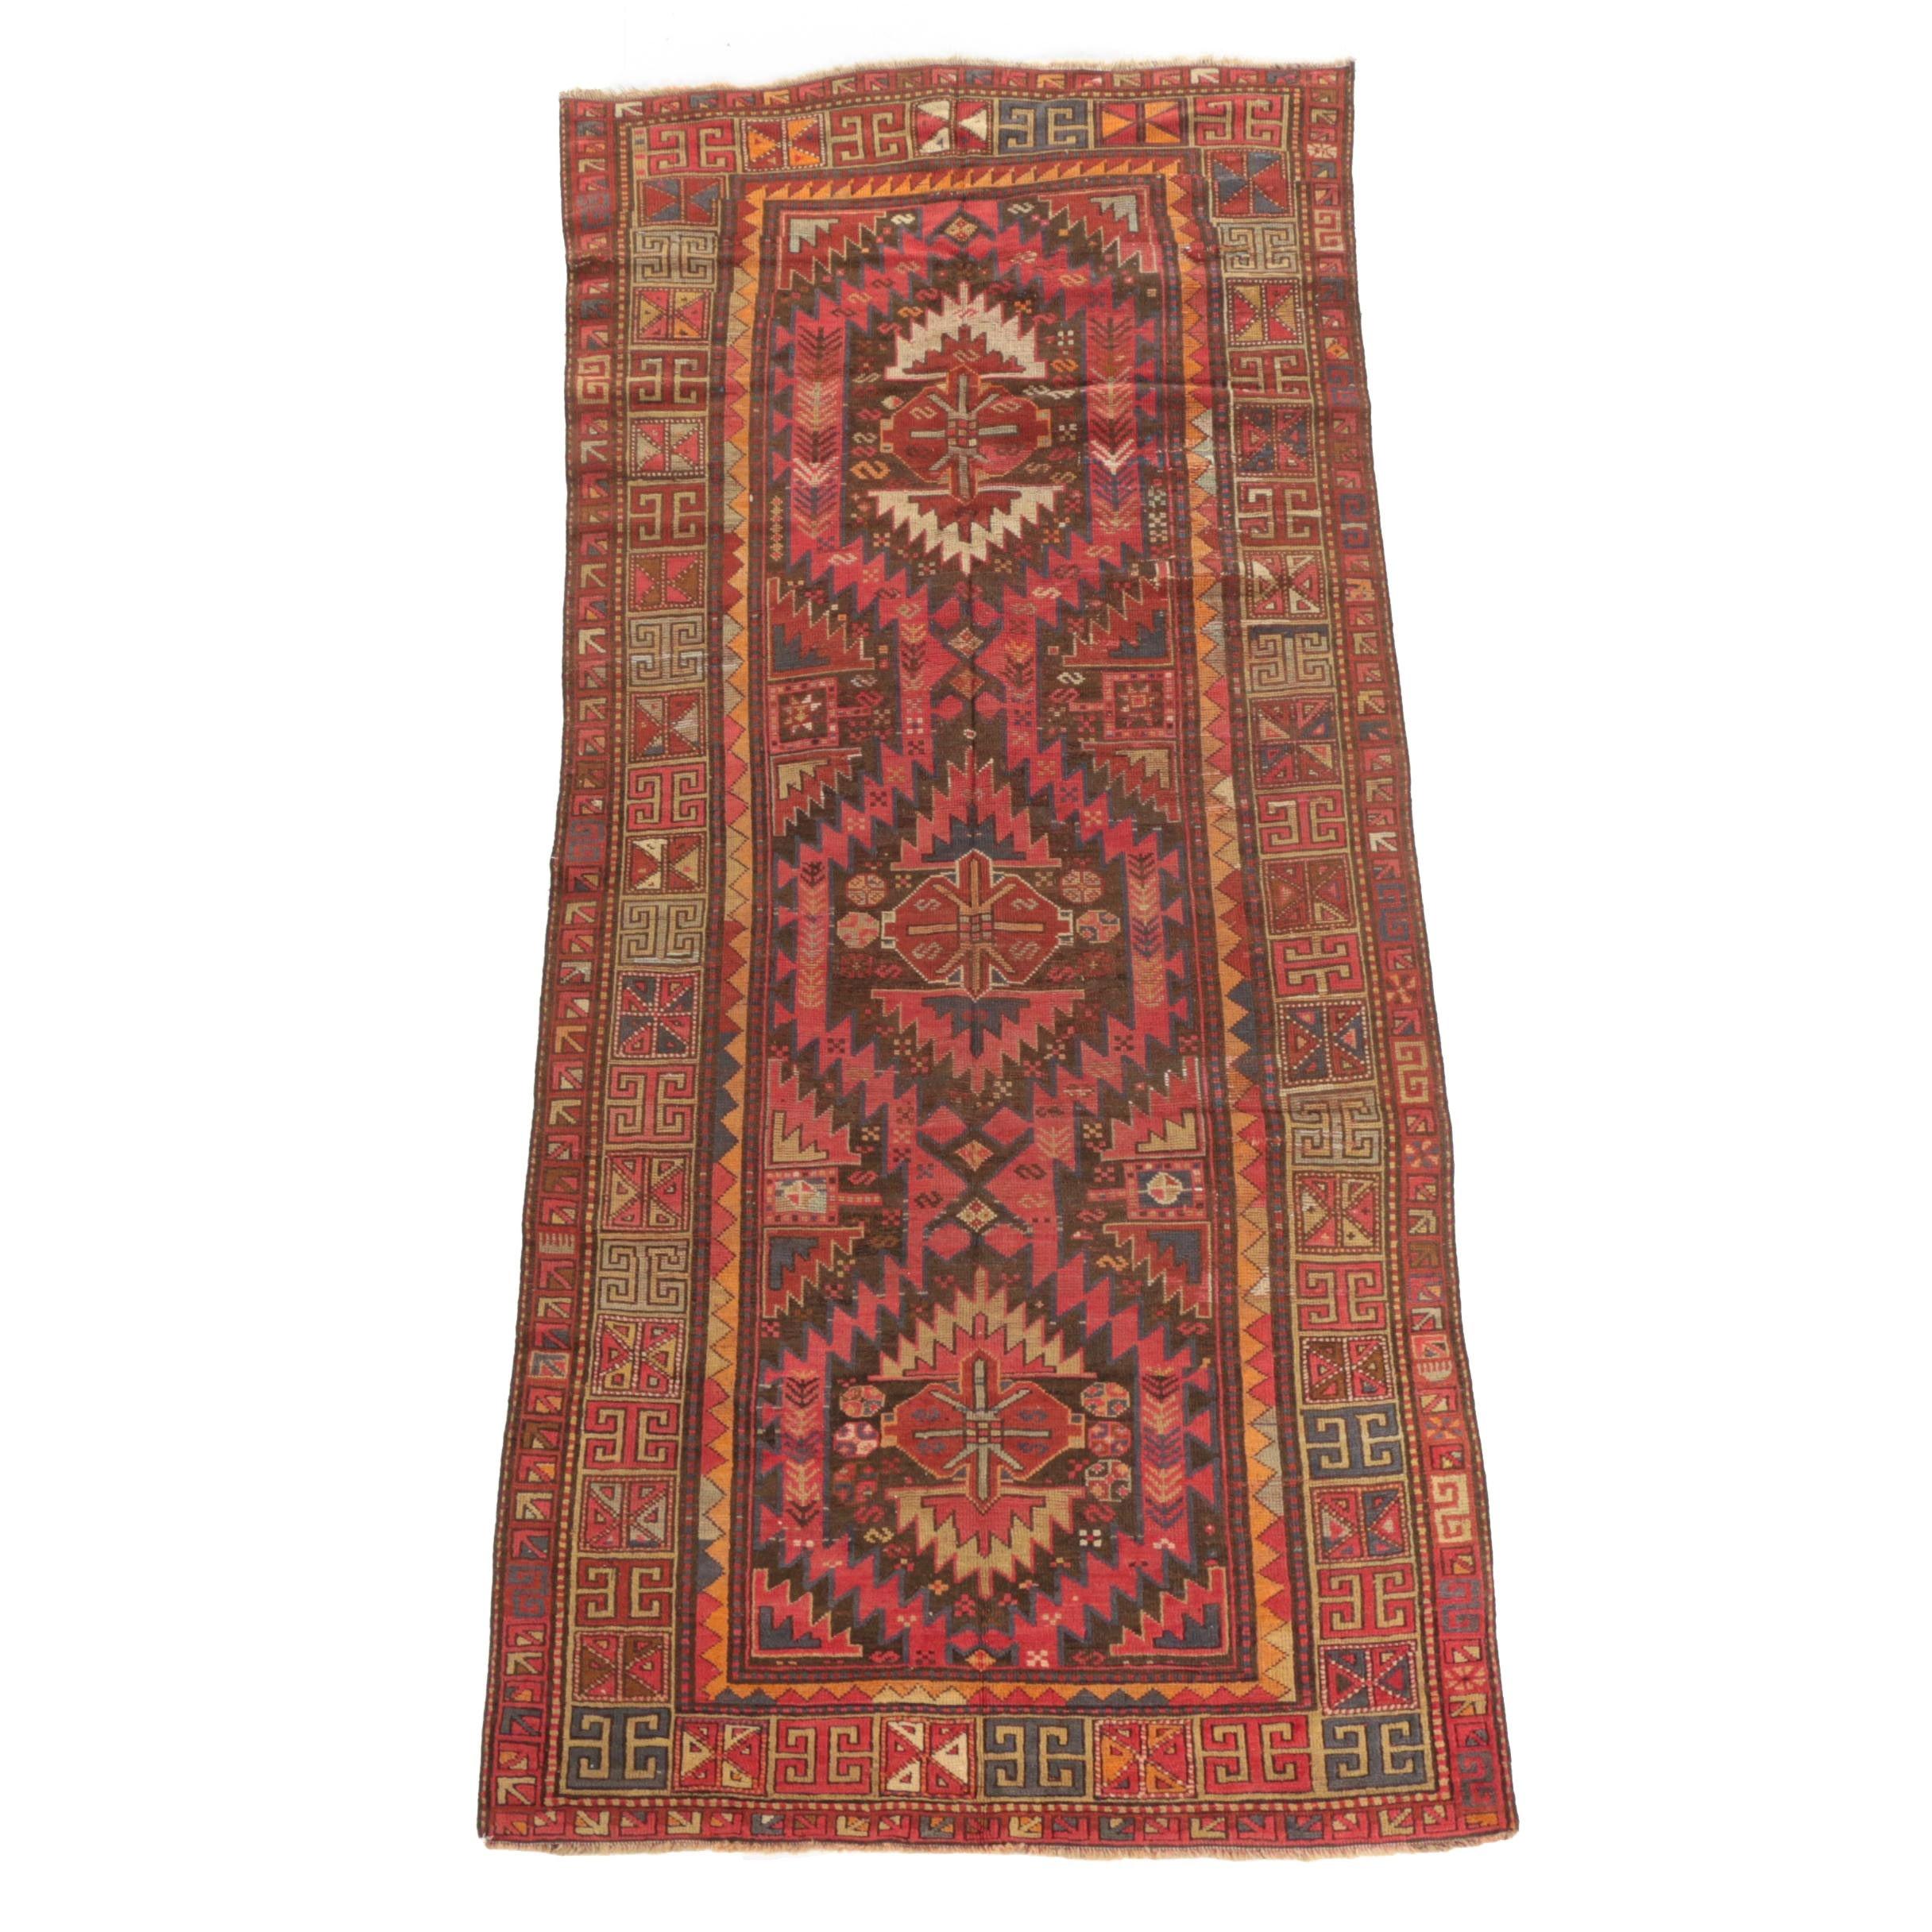 Handwoven Caucasian Kazak Wool Area Rug